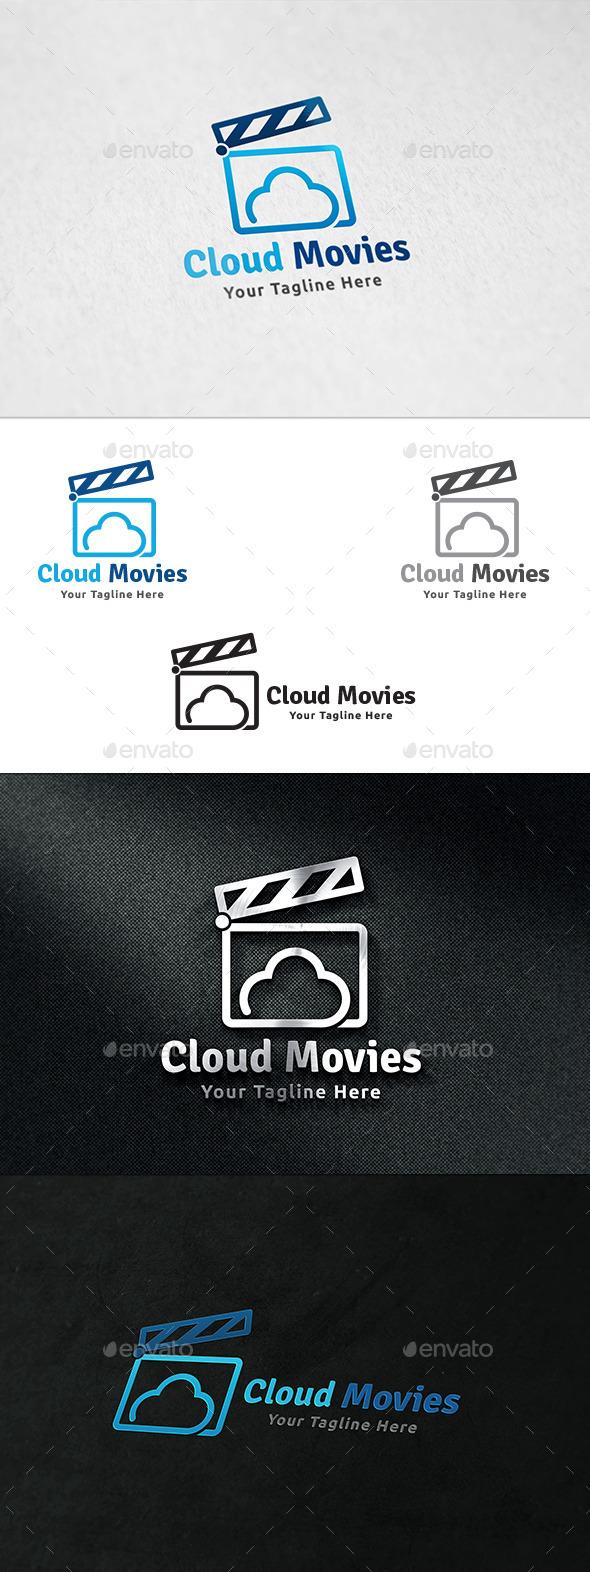 Cloud Movies - Logo Template